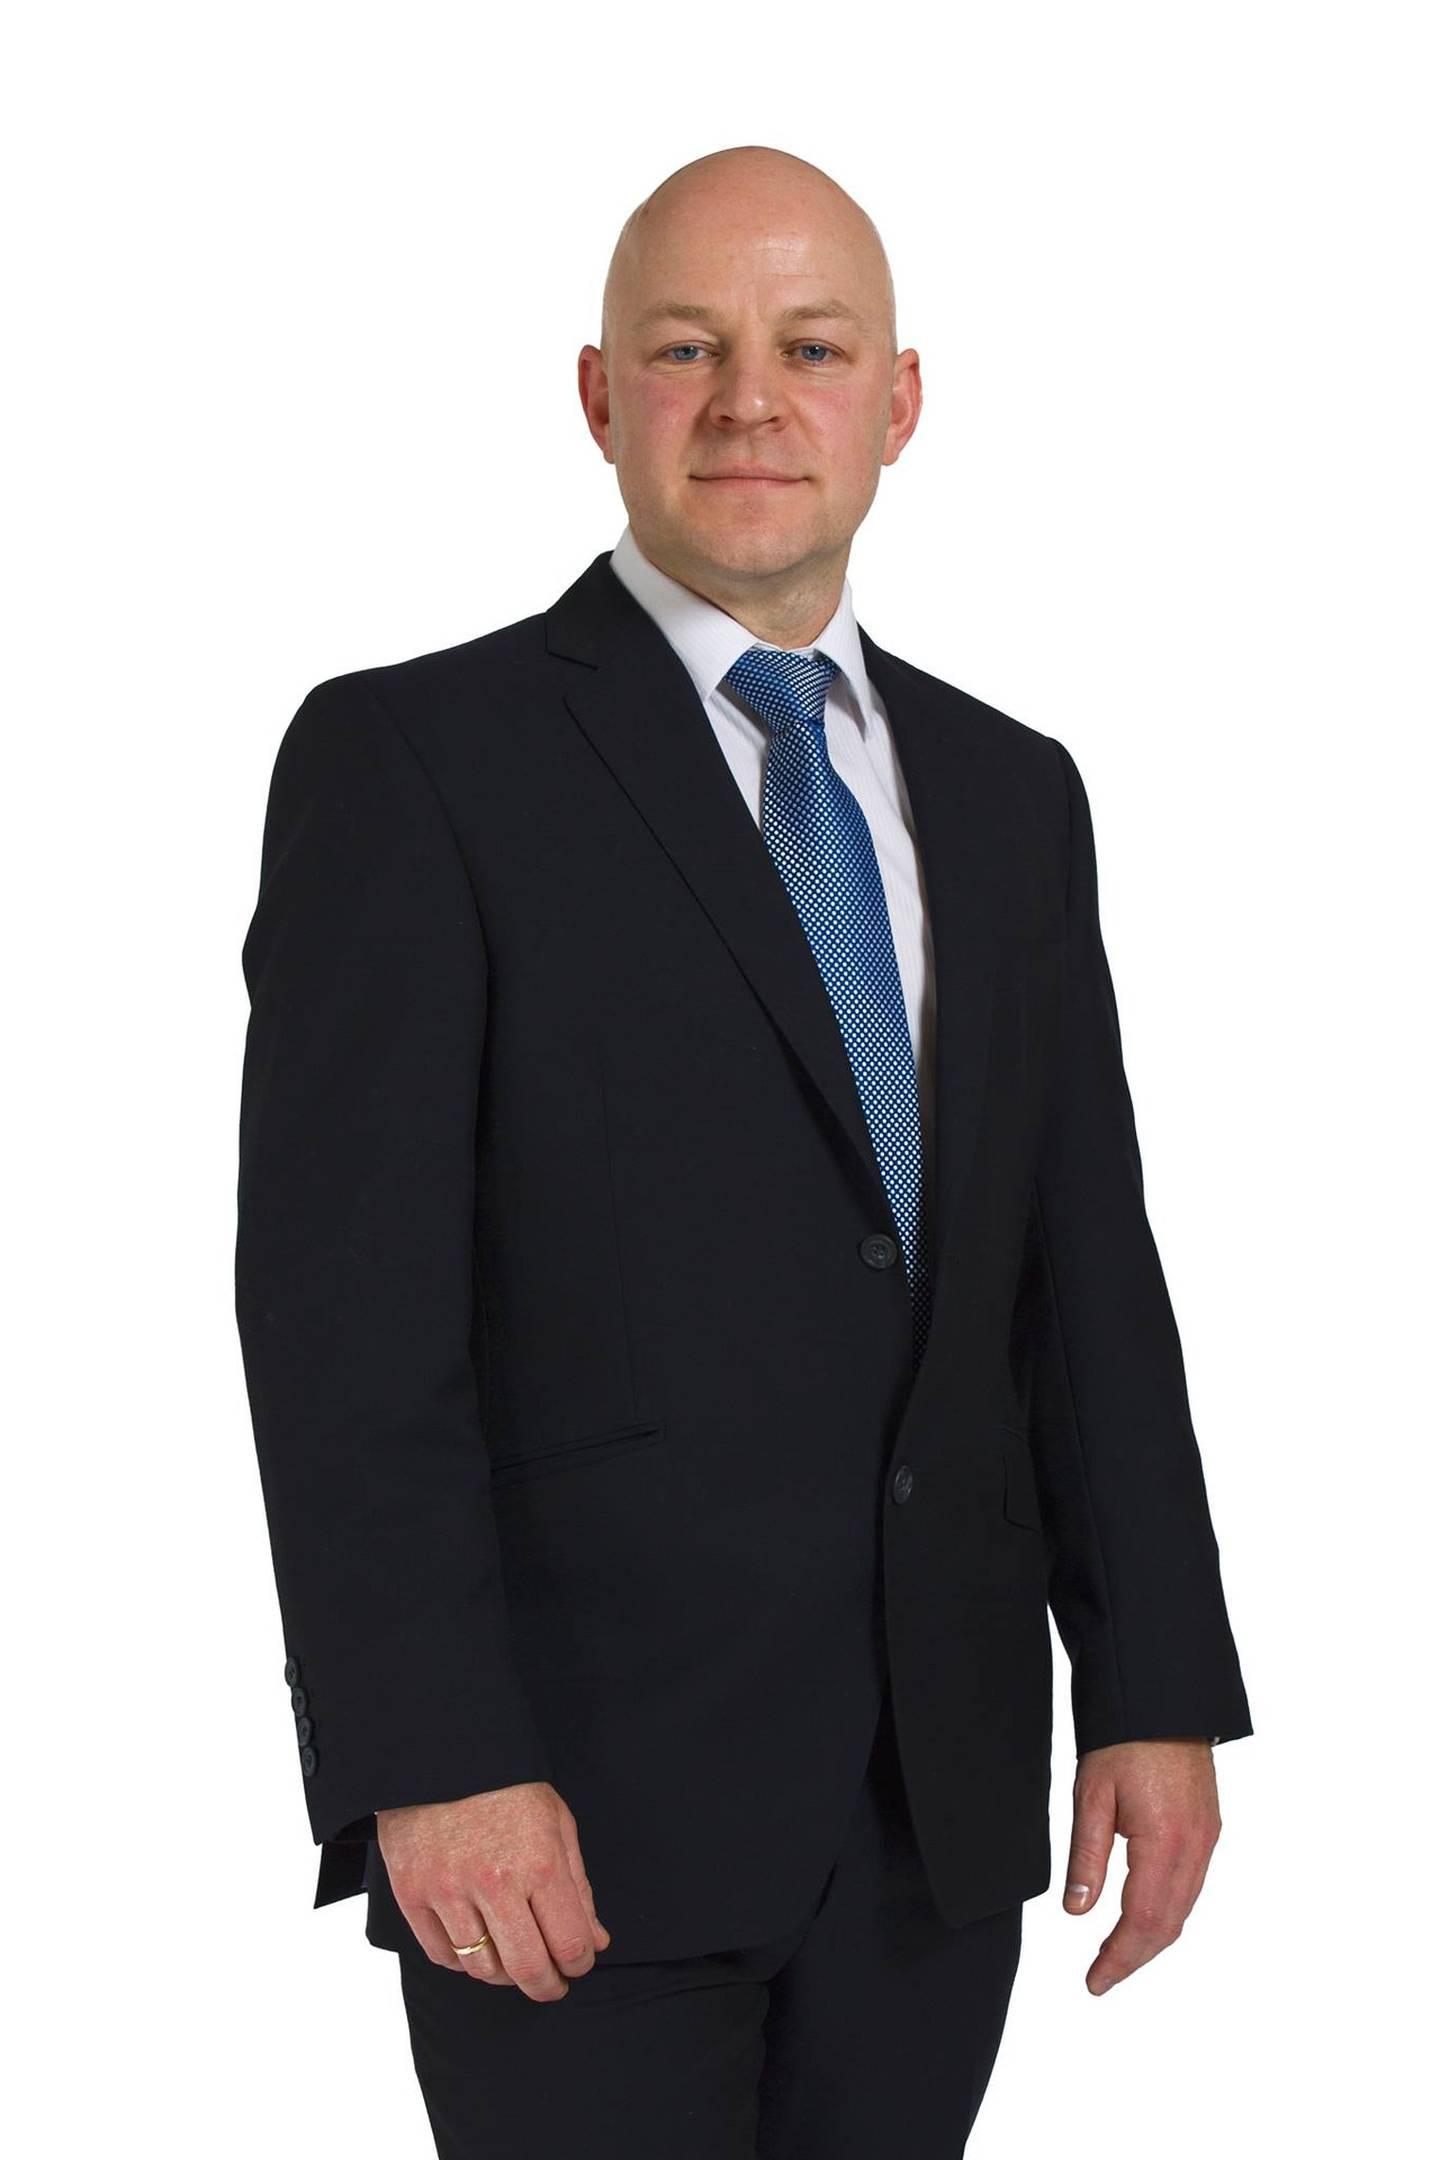 National Party mental health spokesman Matt Doocey. Photo: Supplied